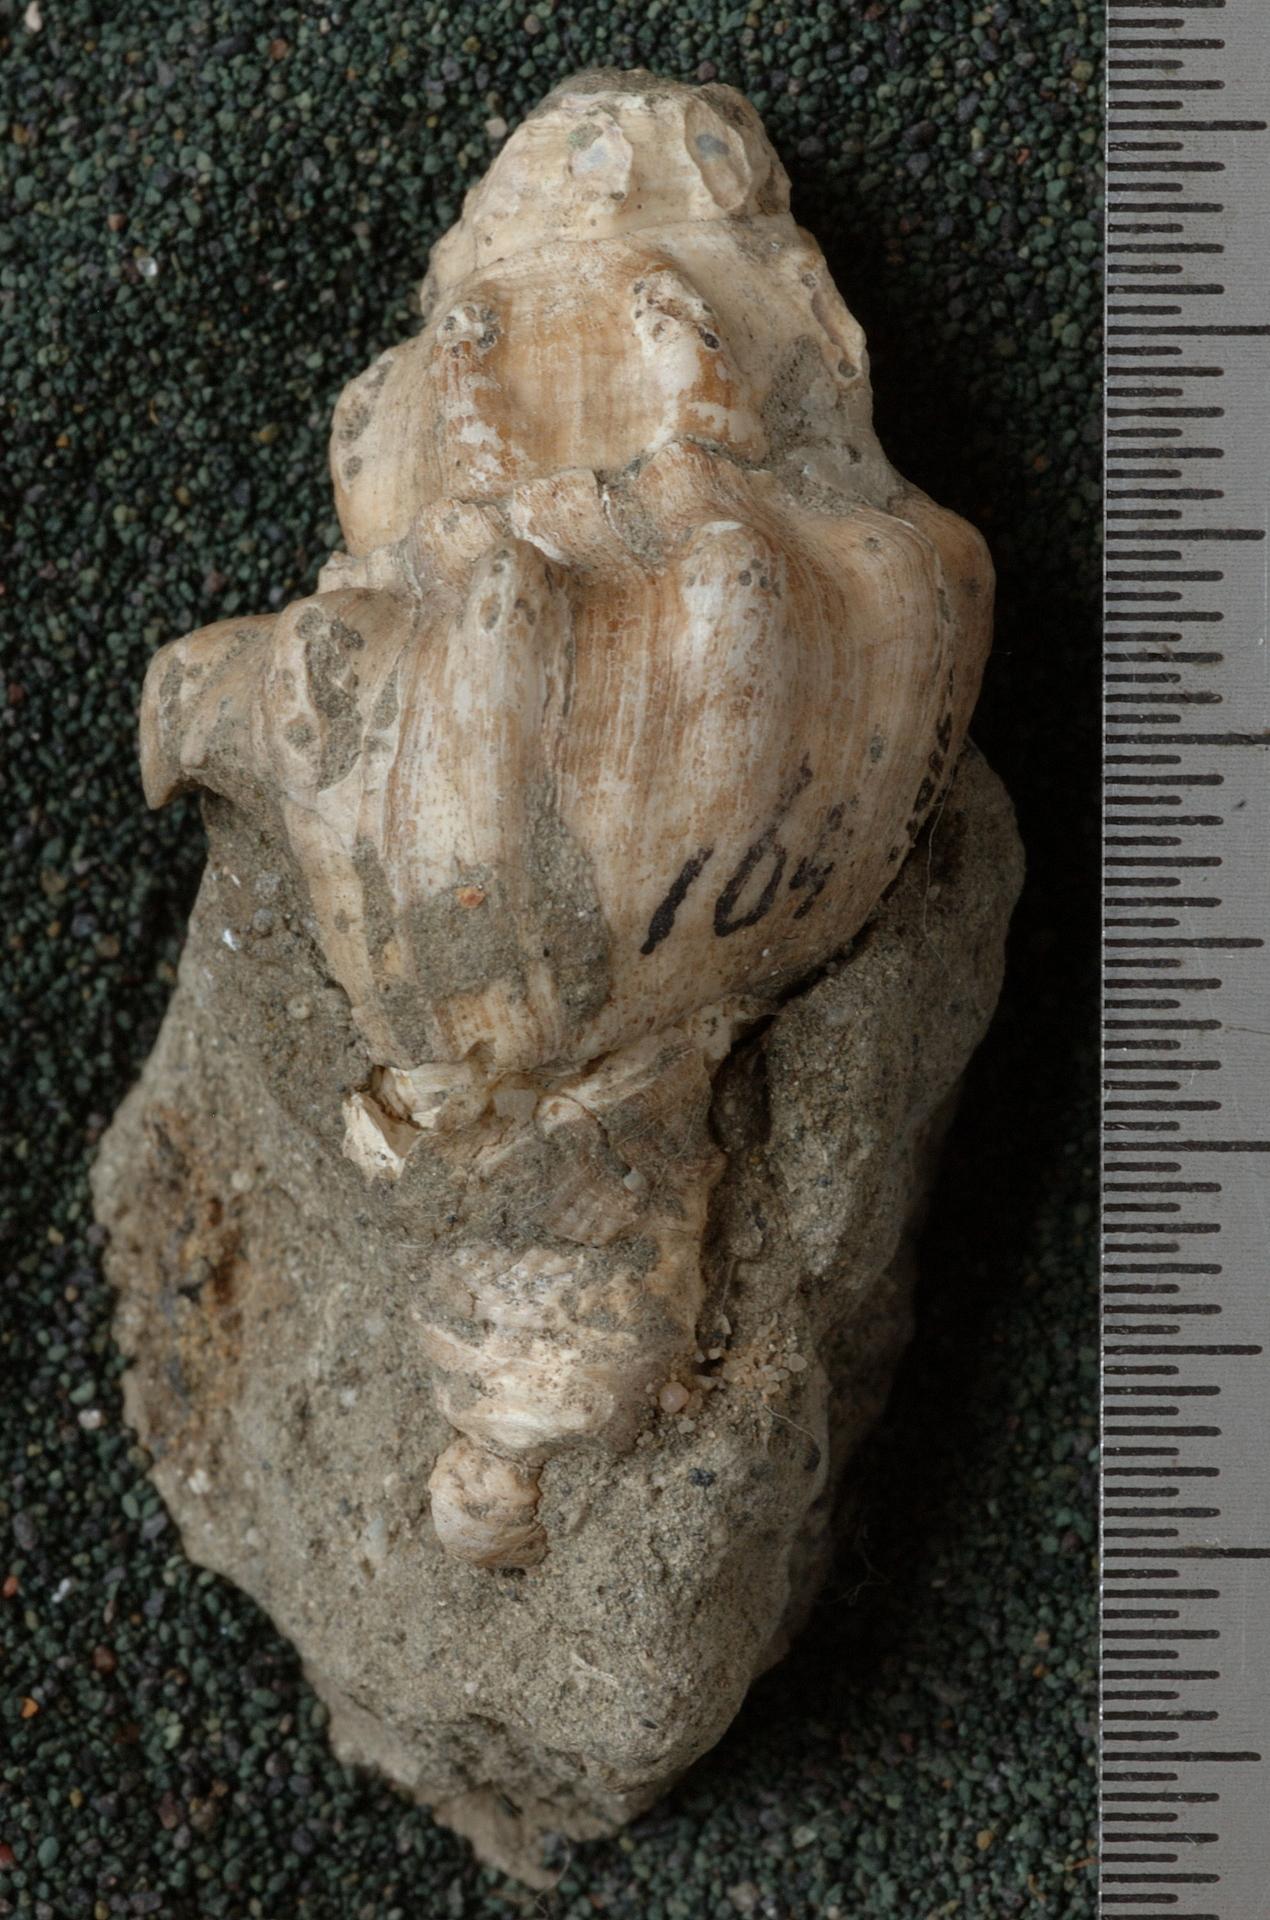 RGM.9161 | Siphonalia (Phoracanthus) ickei Martin, 1914